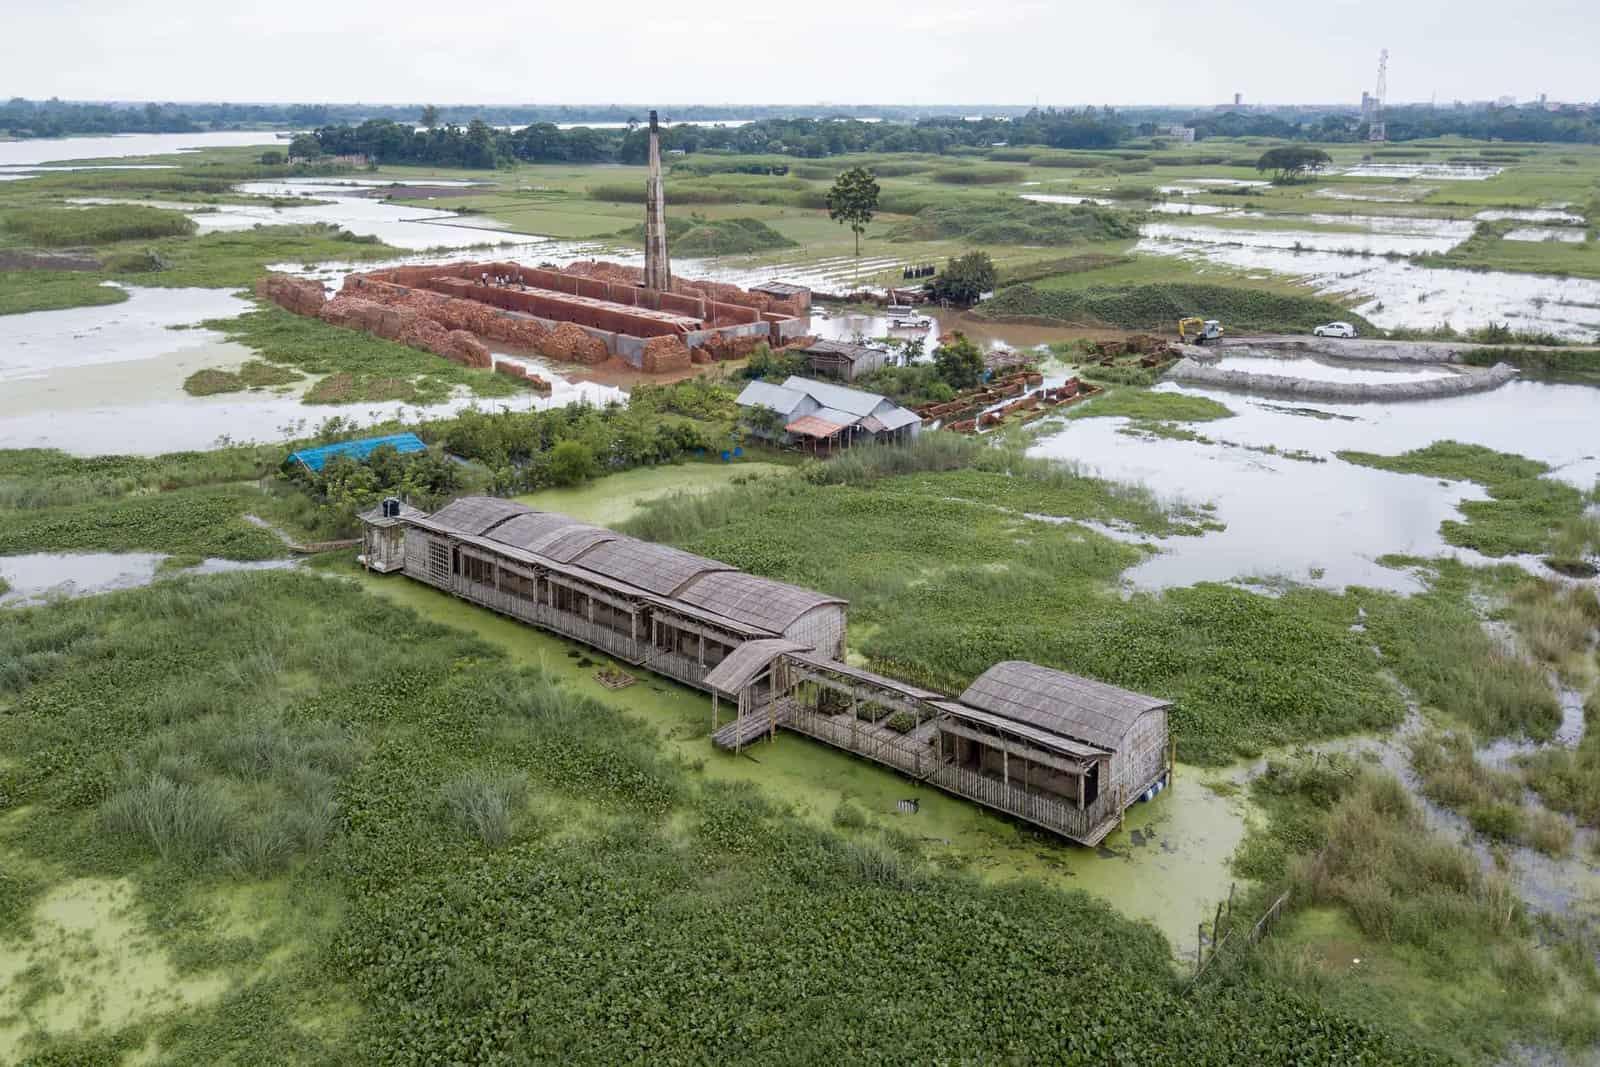 Arcadia School \ Alipur, Keraniganj, Architect: Saif Ul Haque Sthapati \ Copyright: Iwan Baan